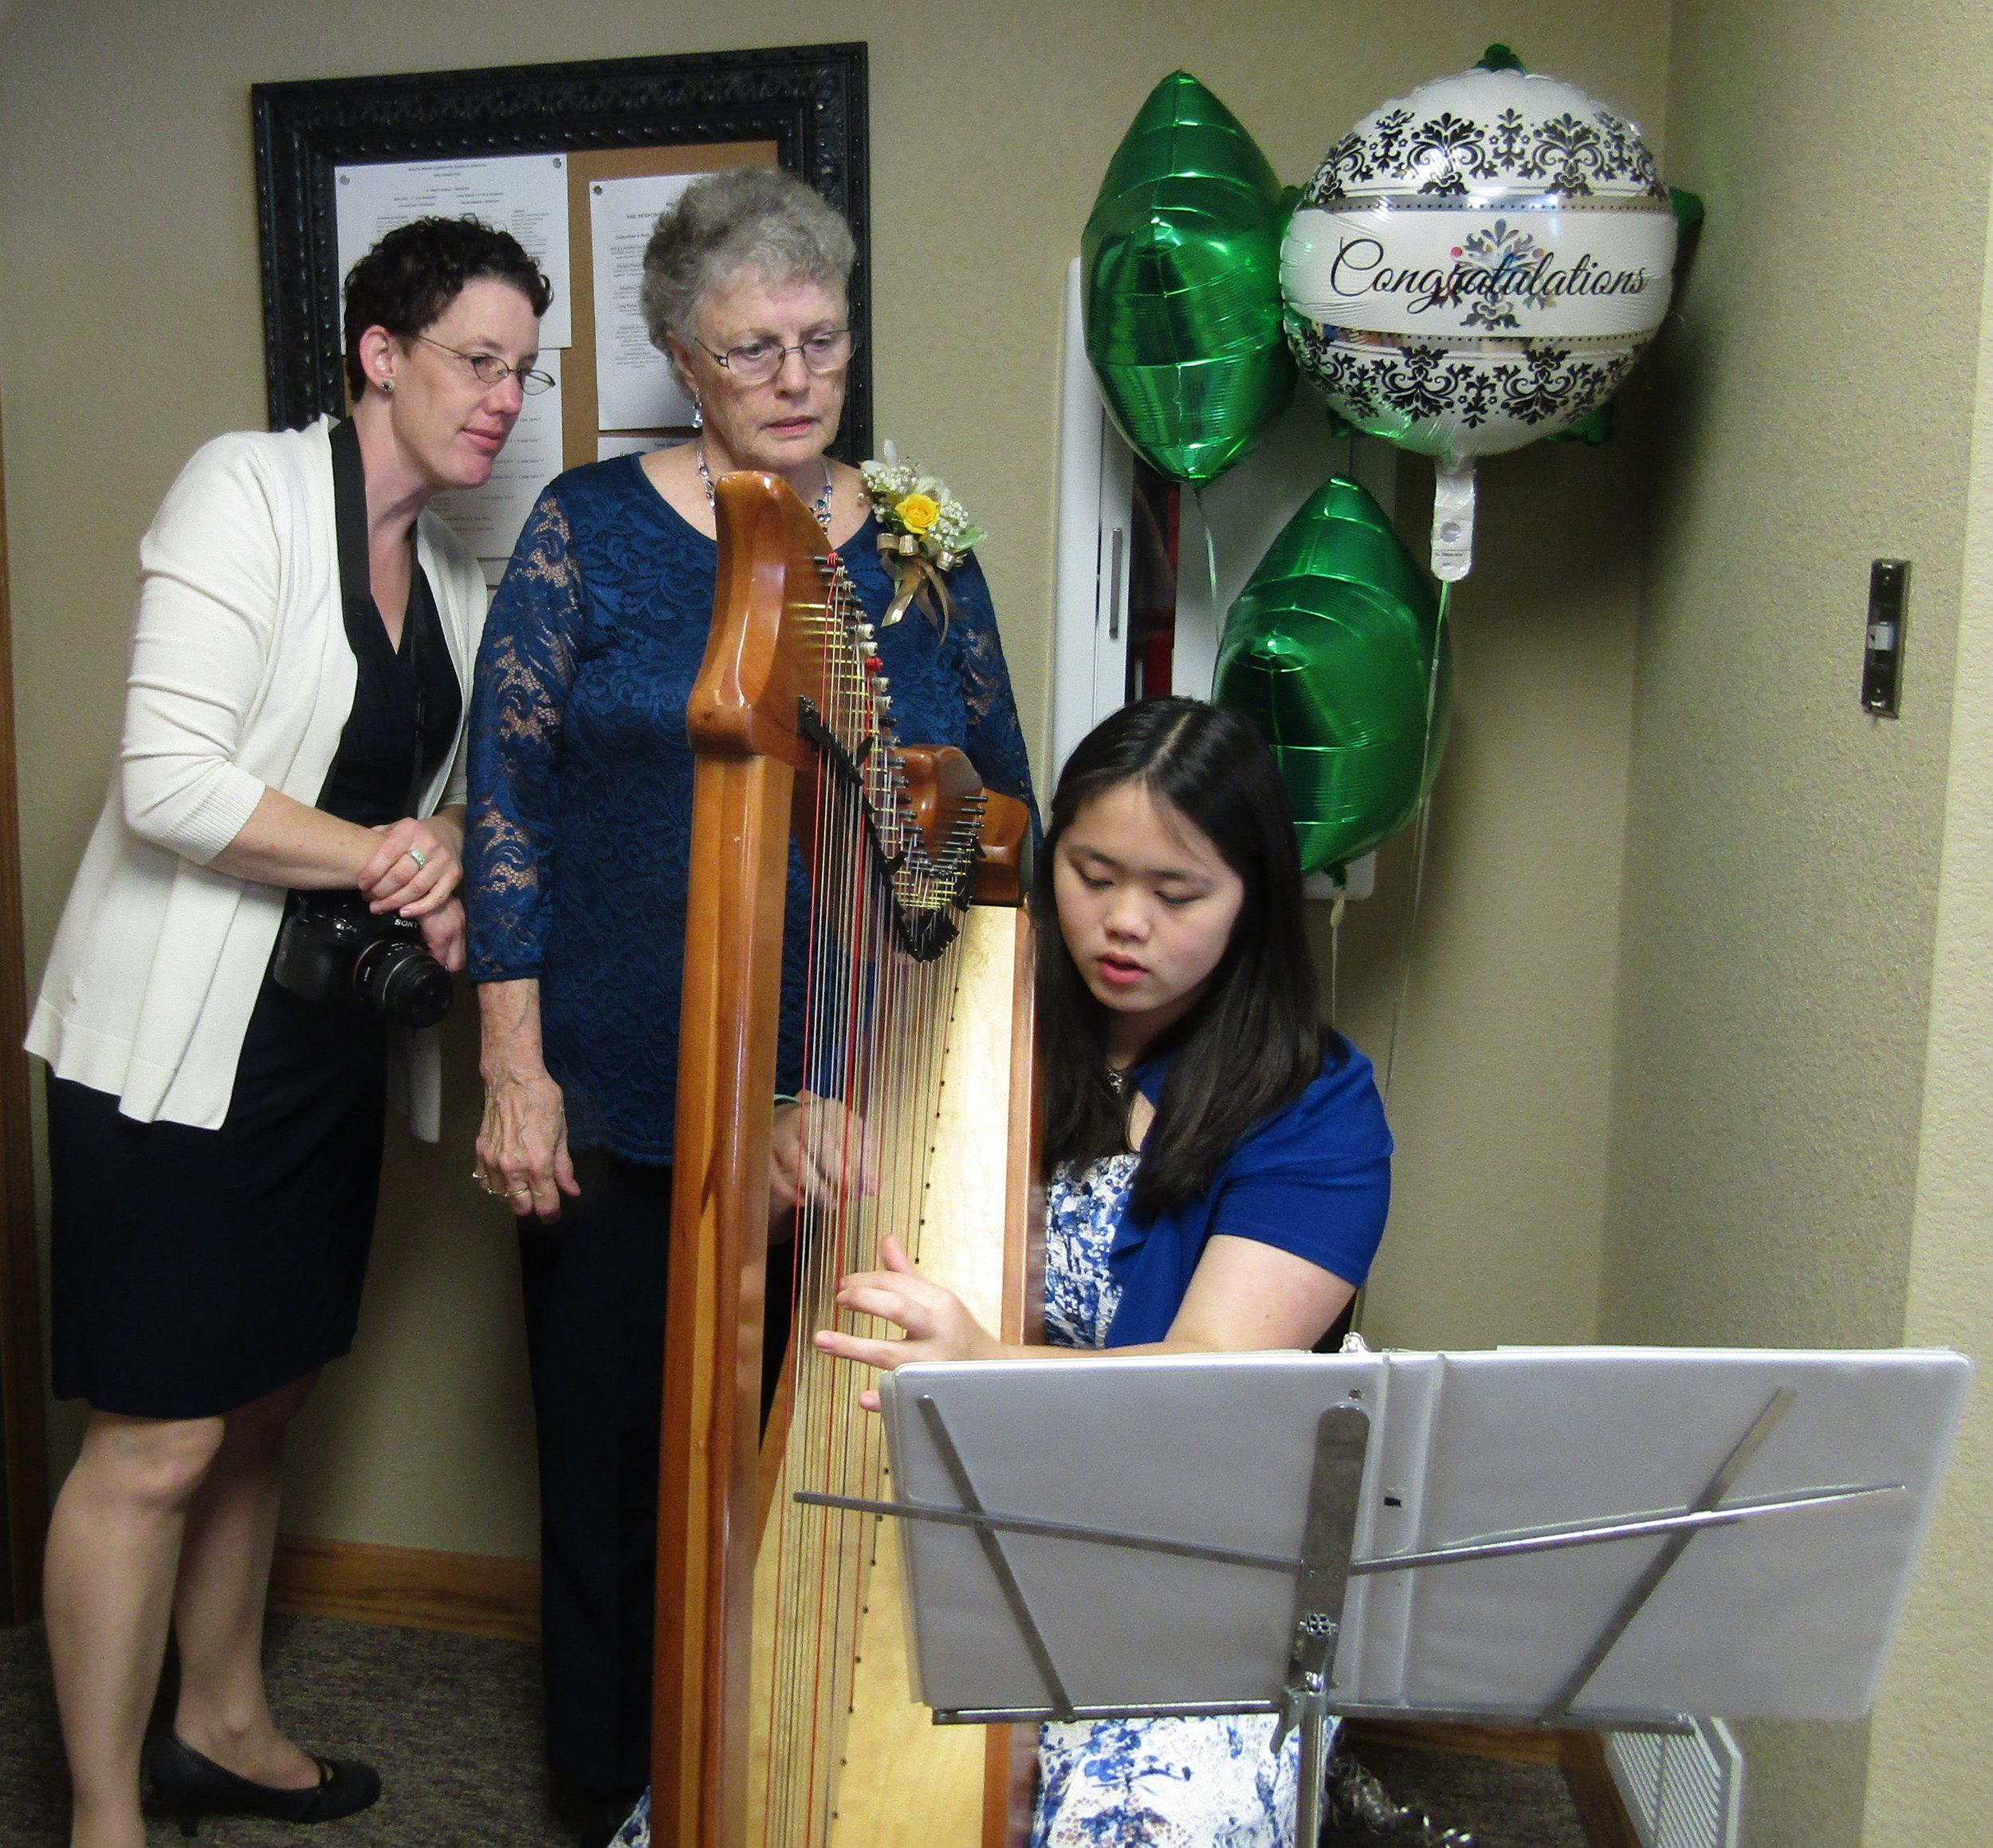 Playing Irish songs for a 50th wedding anniversary.